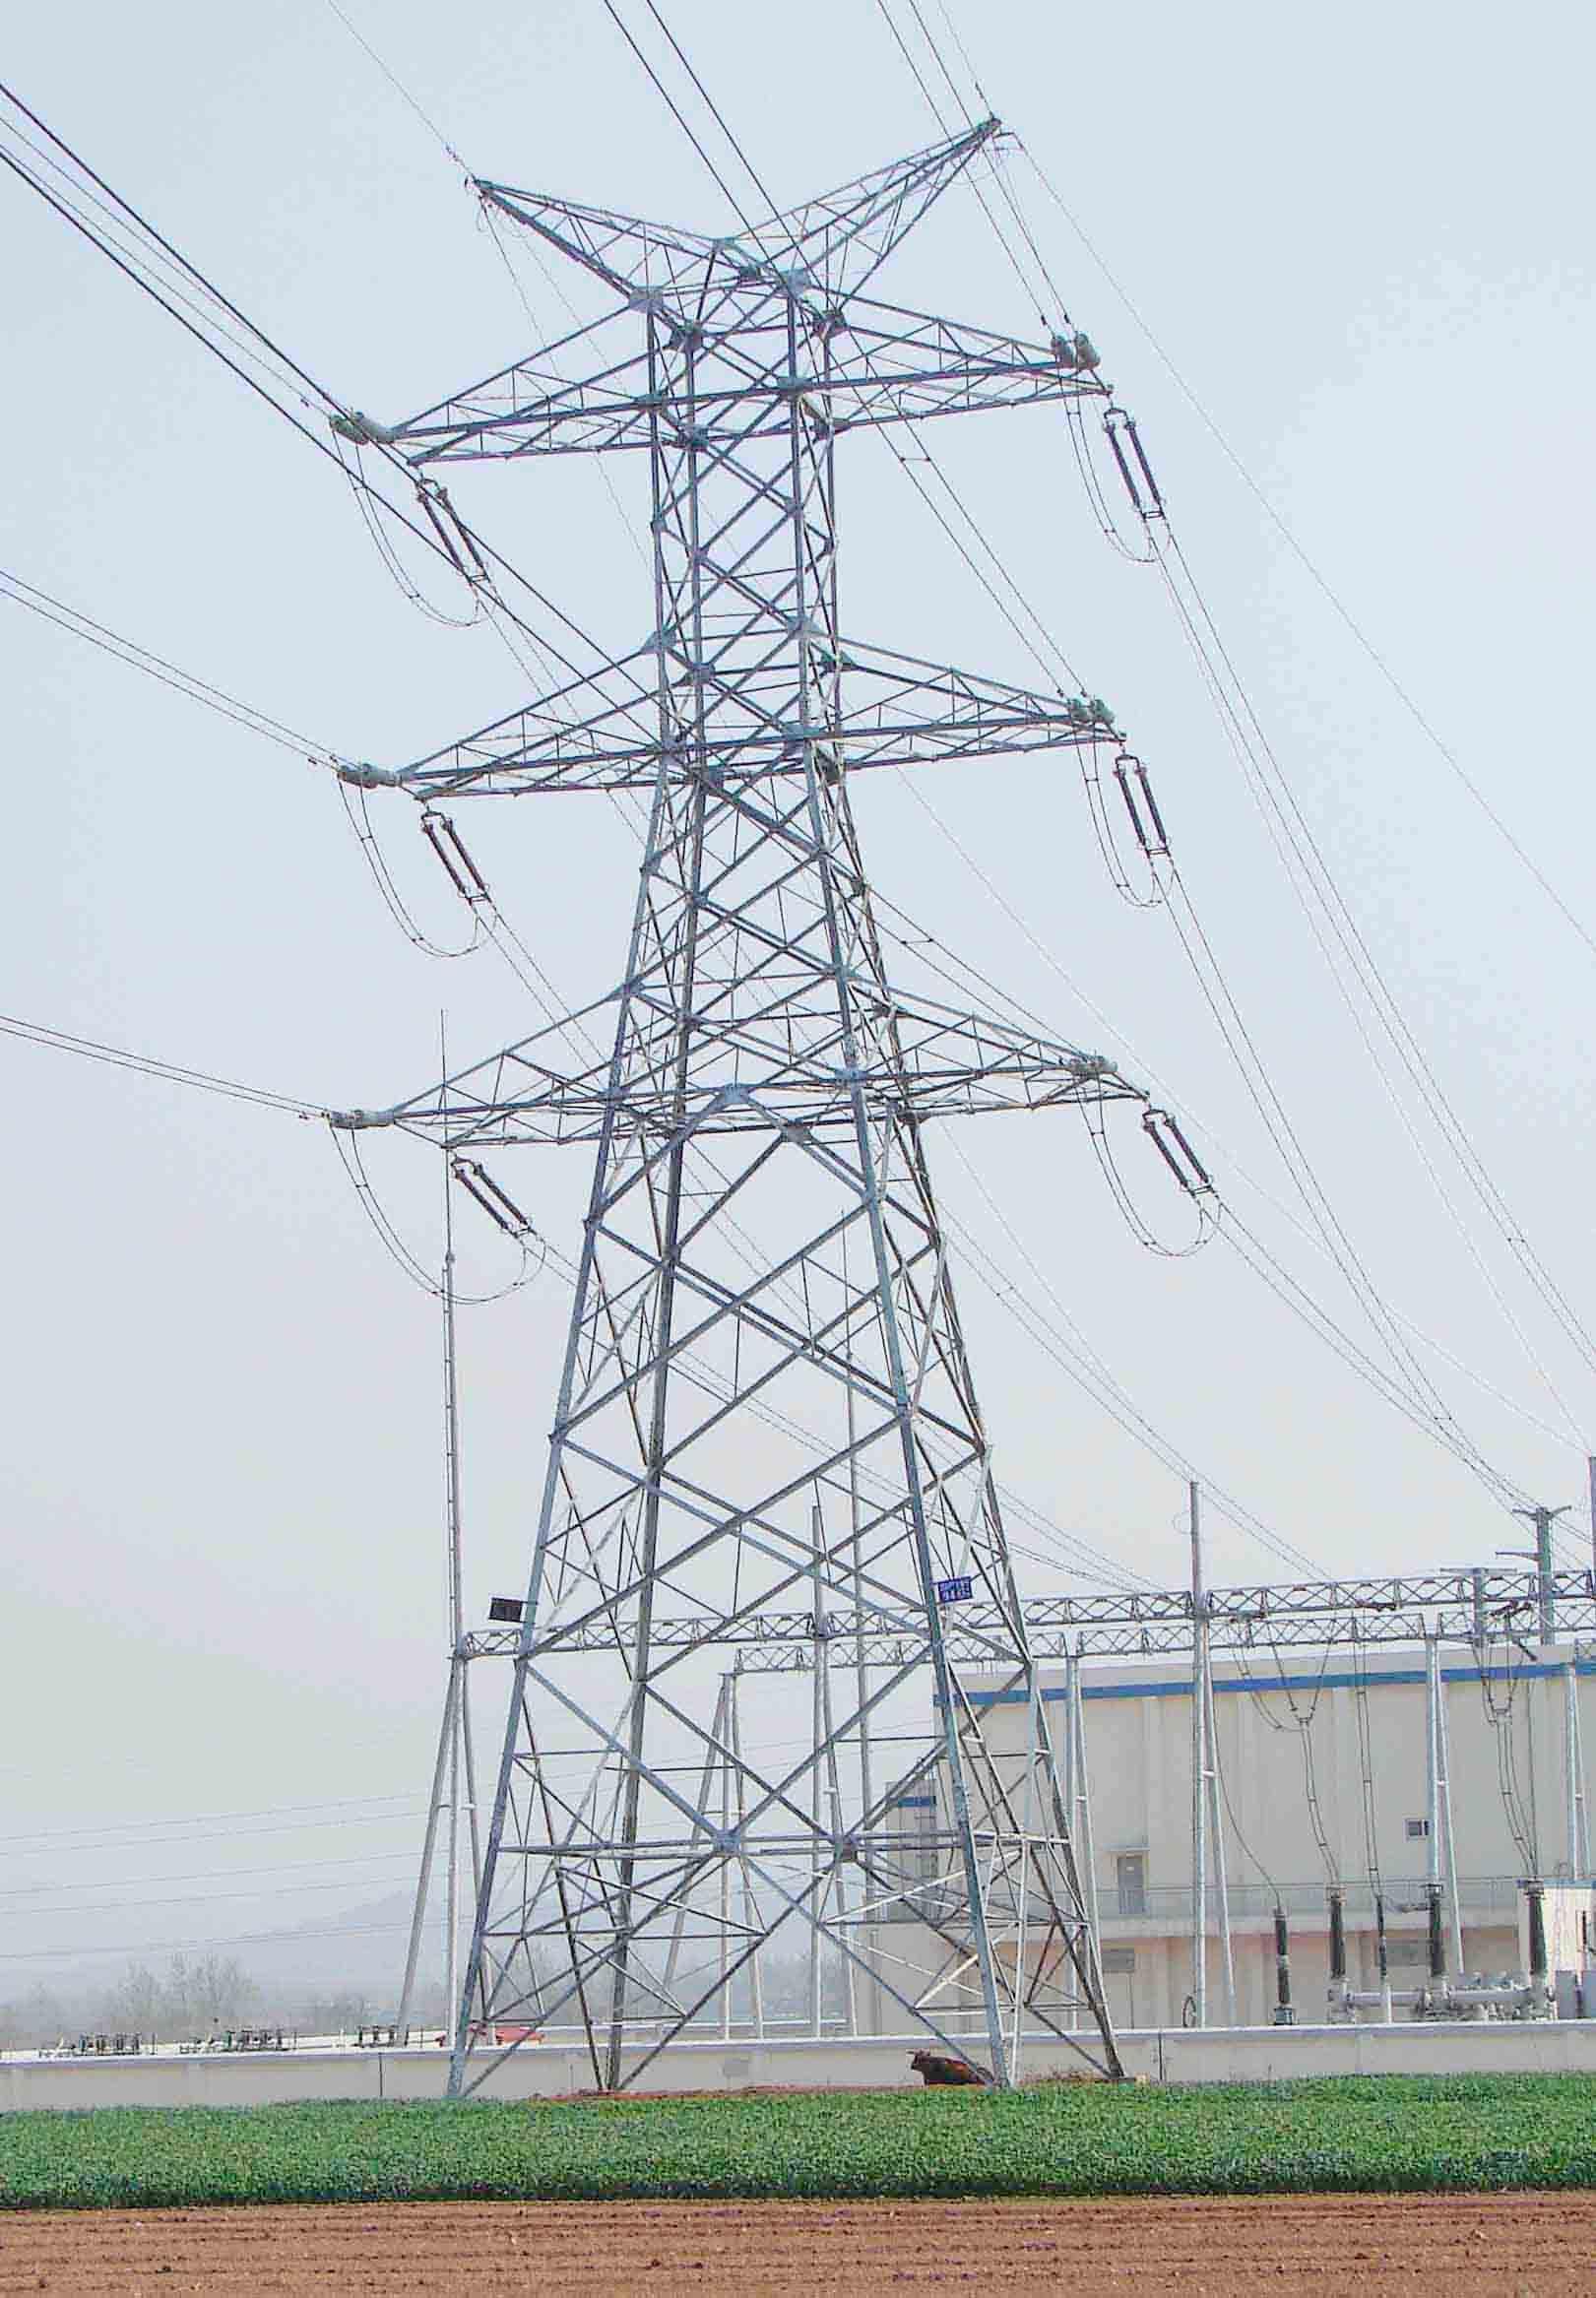 Electric Power Transmission Structures : Kv electric power transmission line tower from qingdao